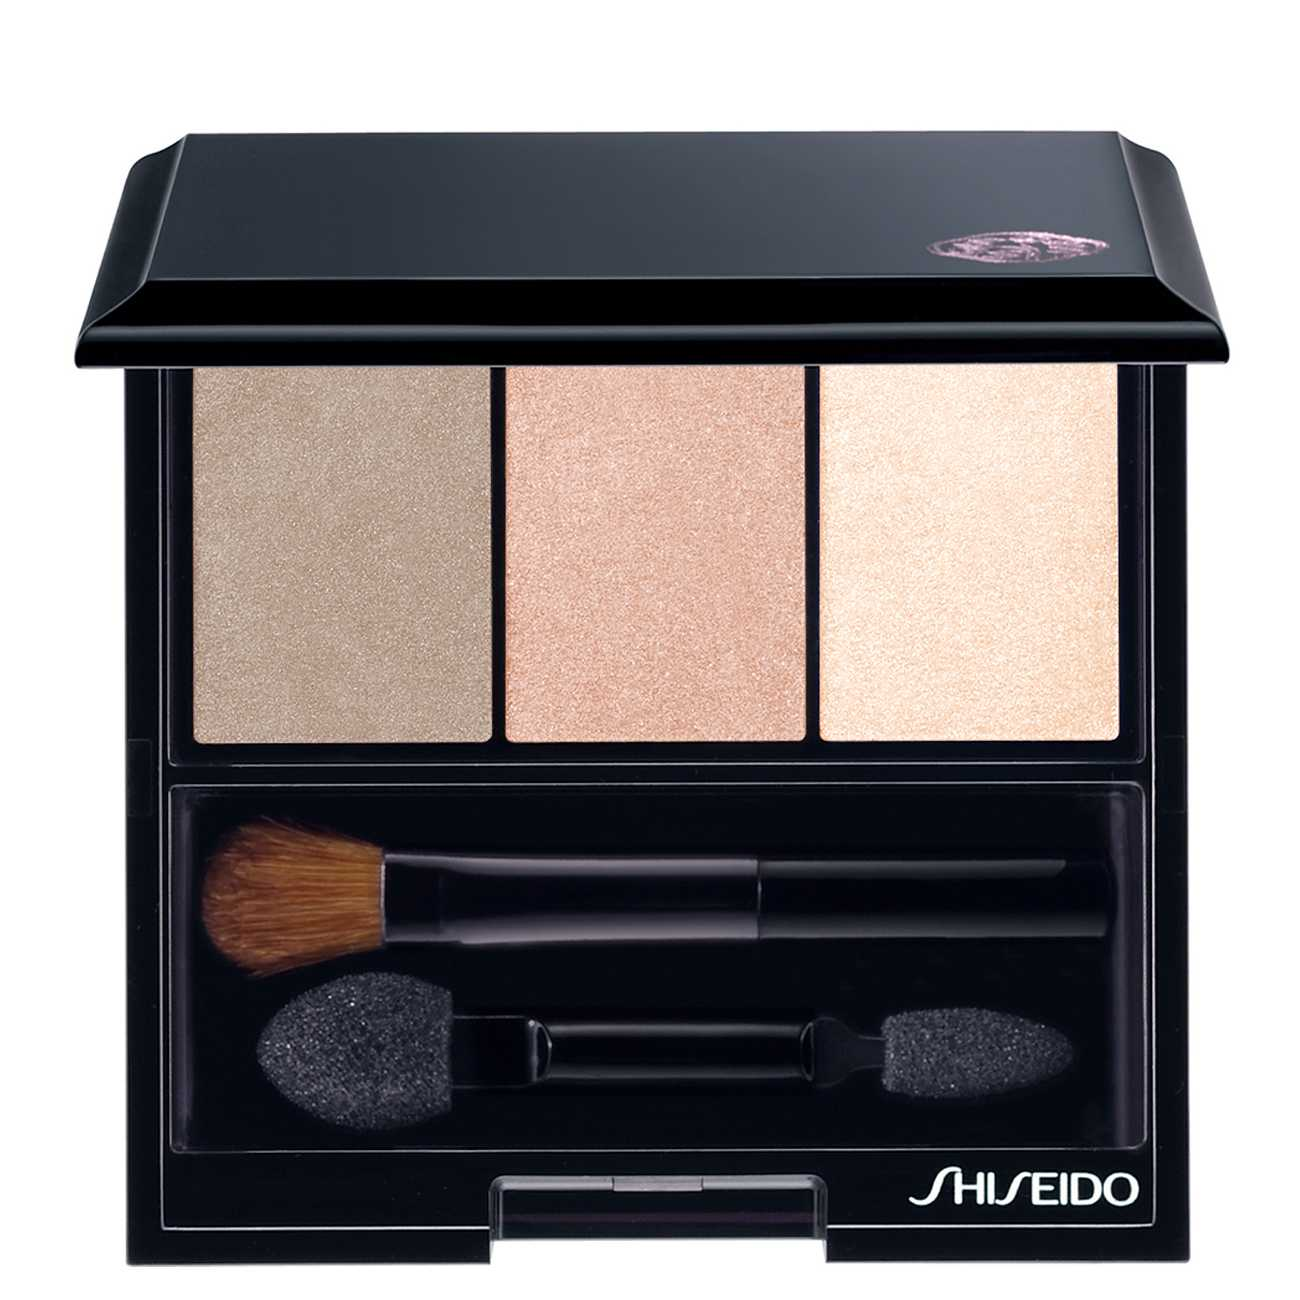 Luminizing Satin Eye Trio 3 G Nude Be213 Shiseido imagine 2021 bestvalue.eu